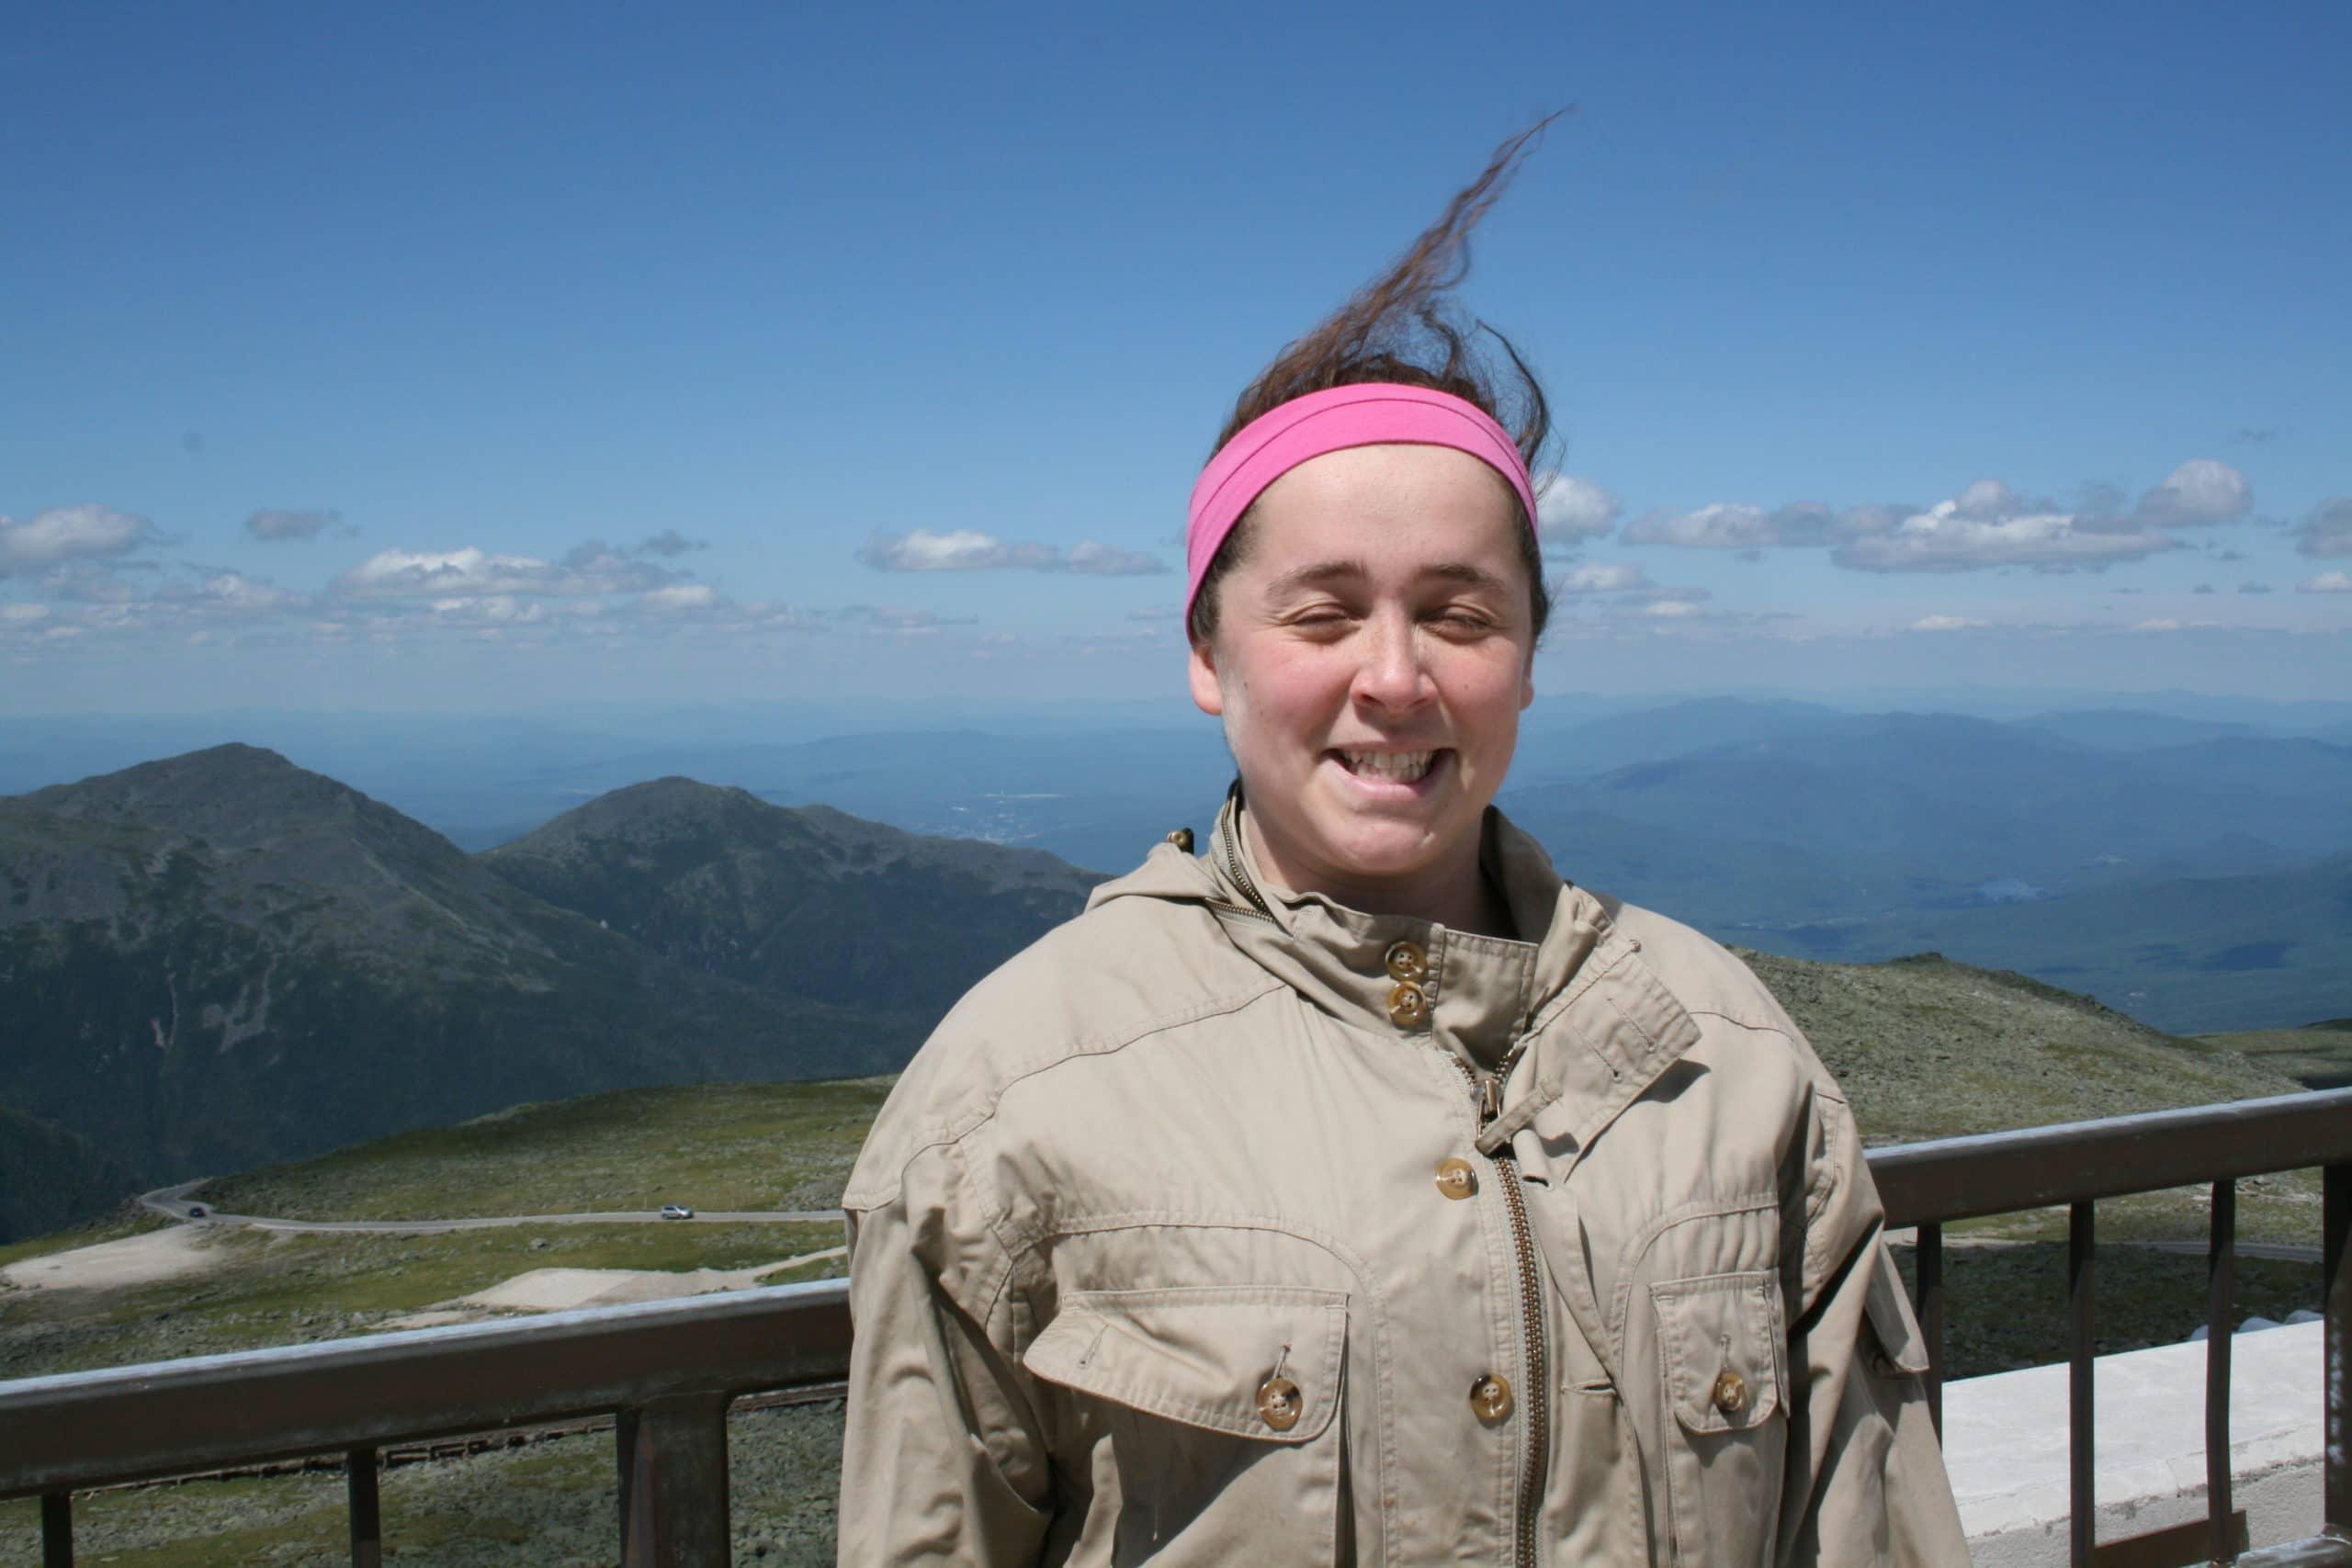 Adventures on the Cog Railway! Explore New Hampshire's Mt. Washington 6